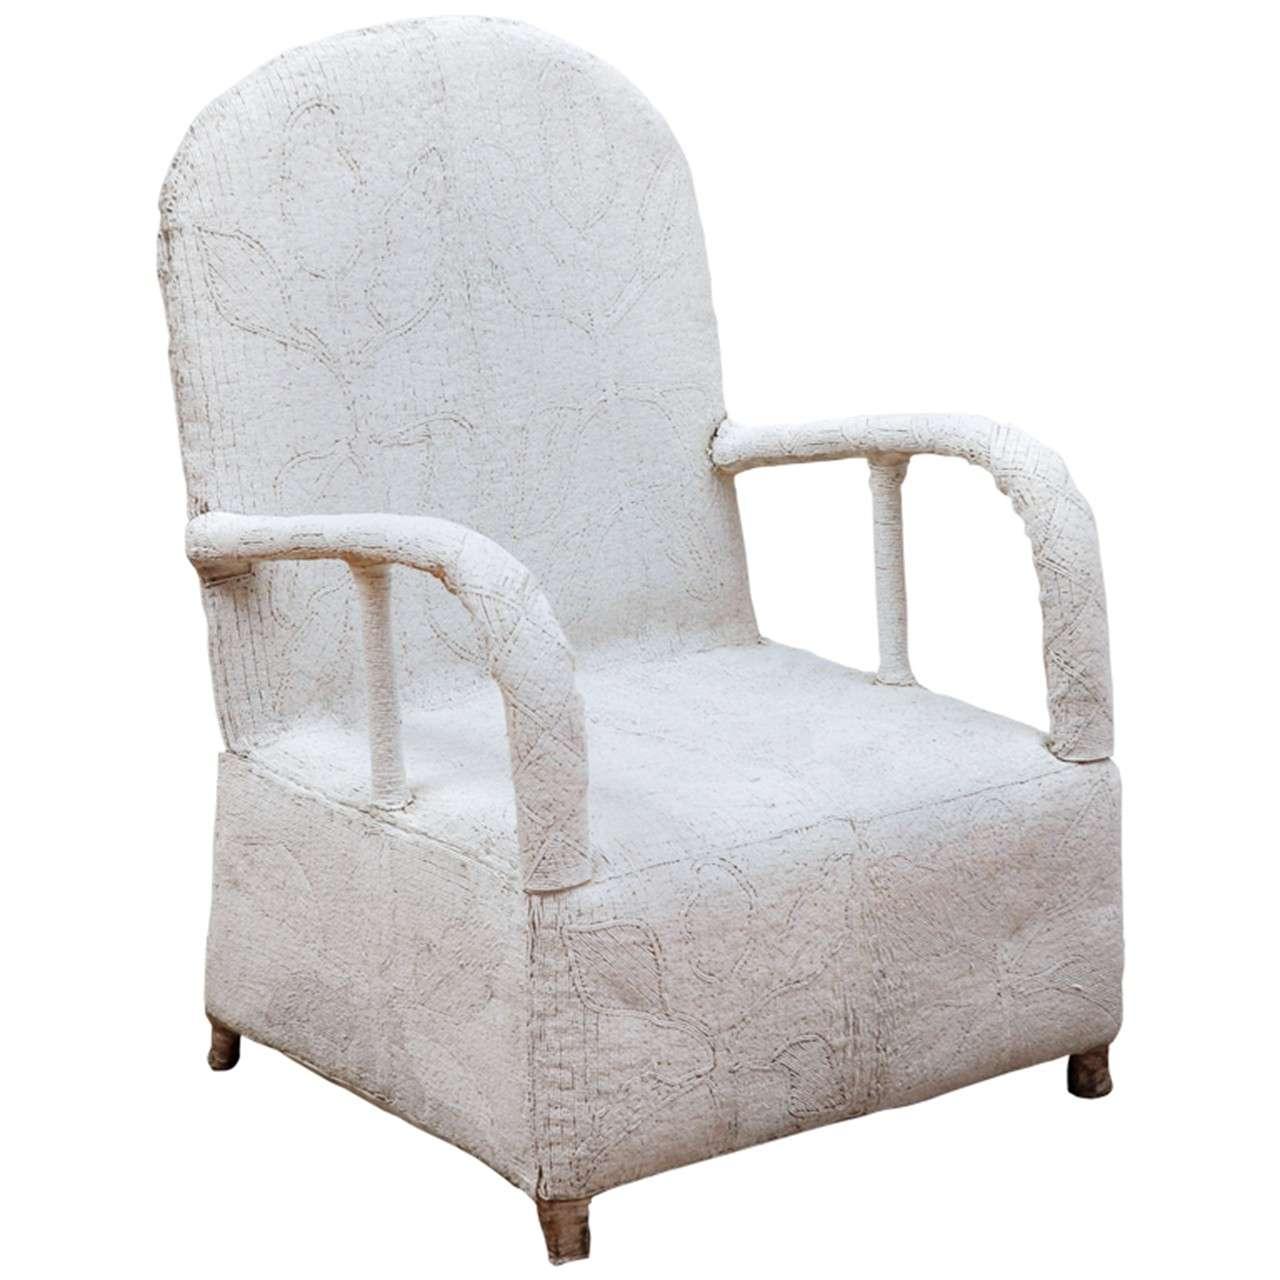 White Beaded Yoruba Chair For Sale